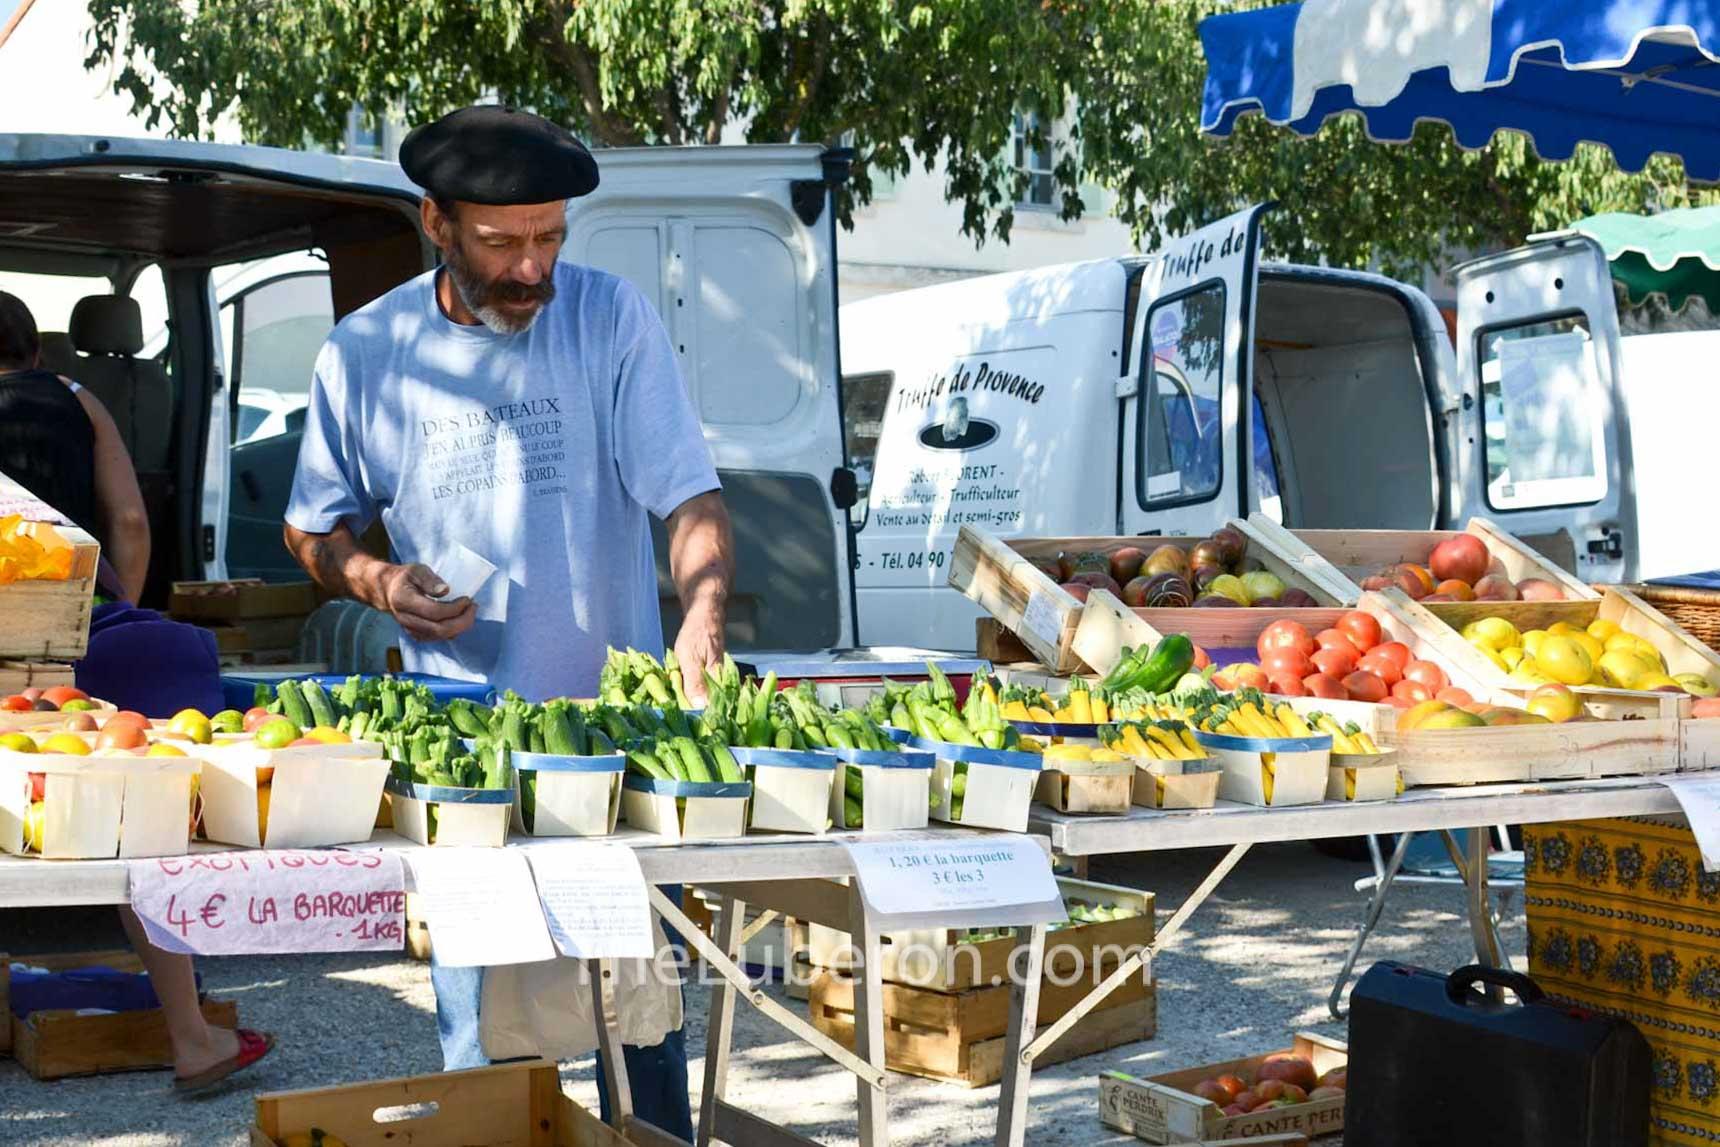 Vegetable stall at Coustellet farmers' market